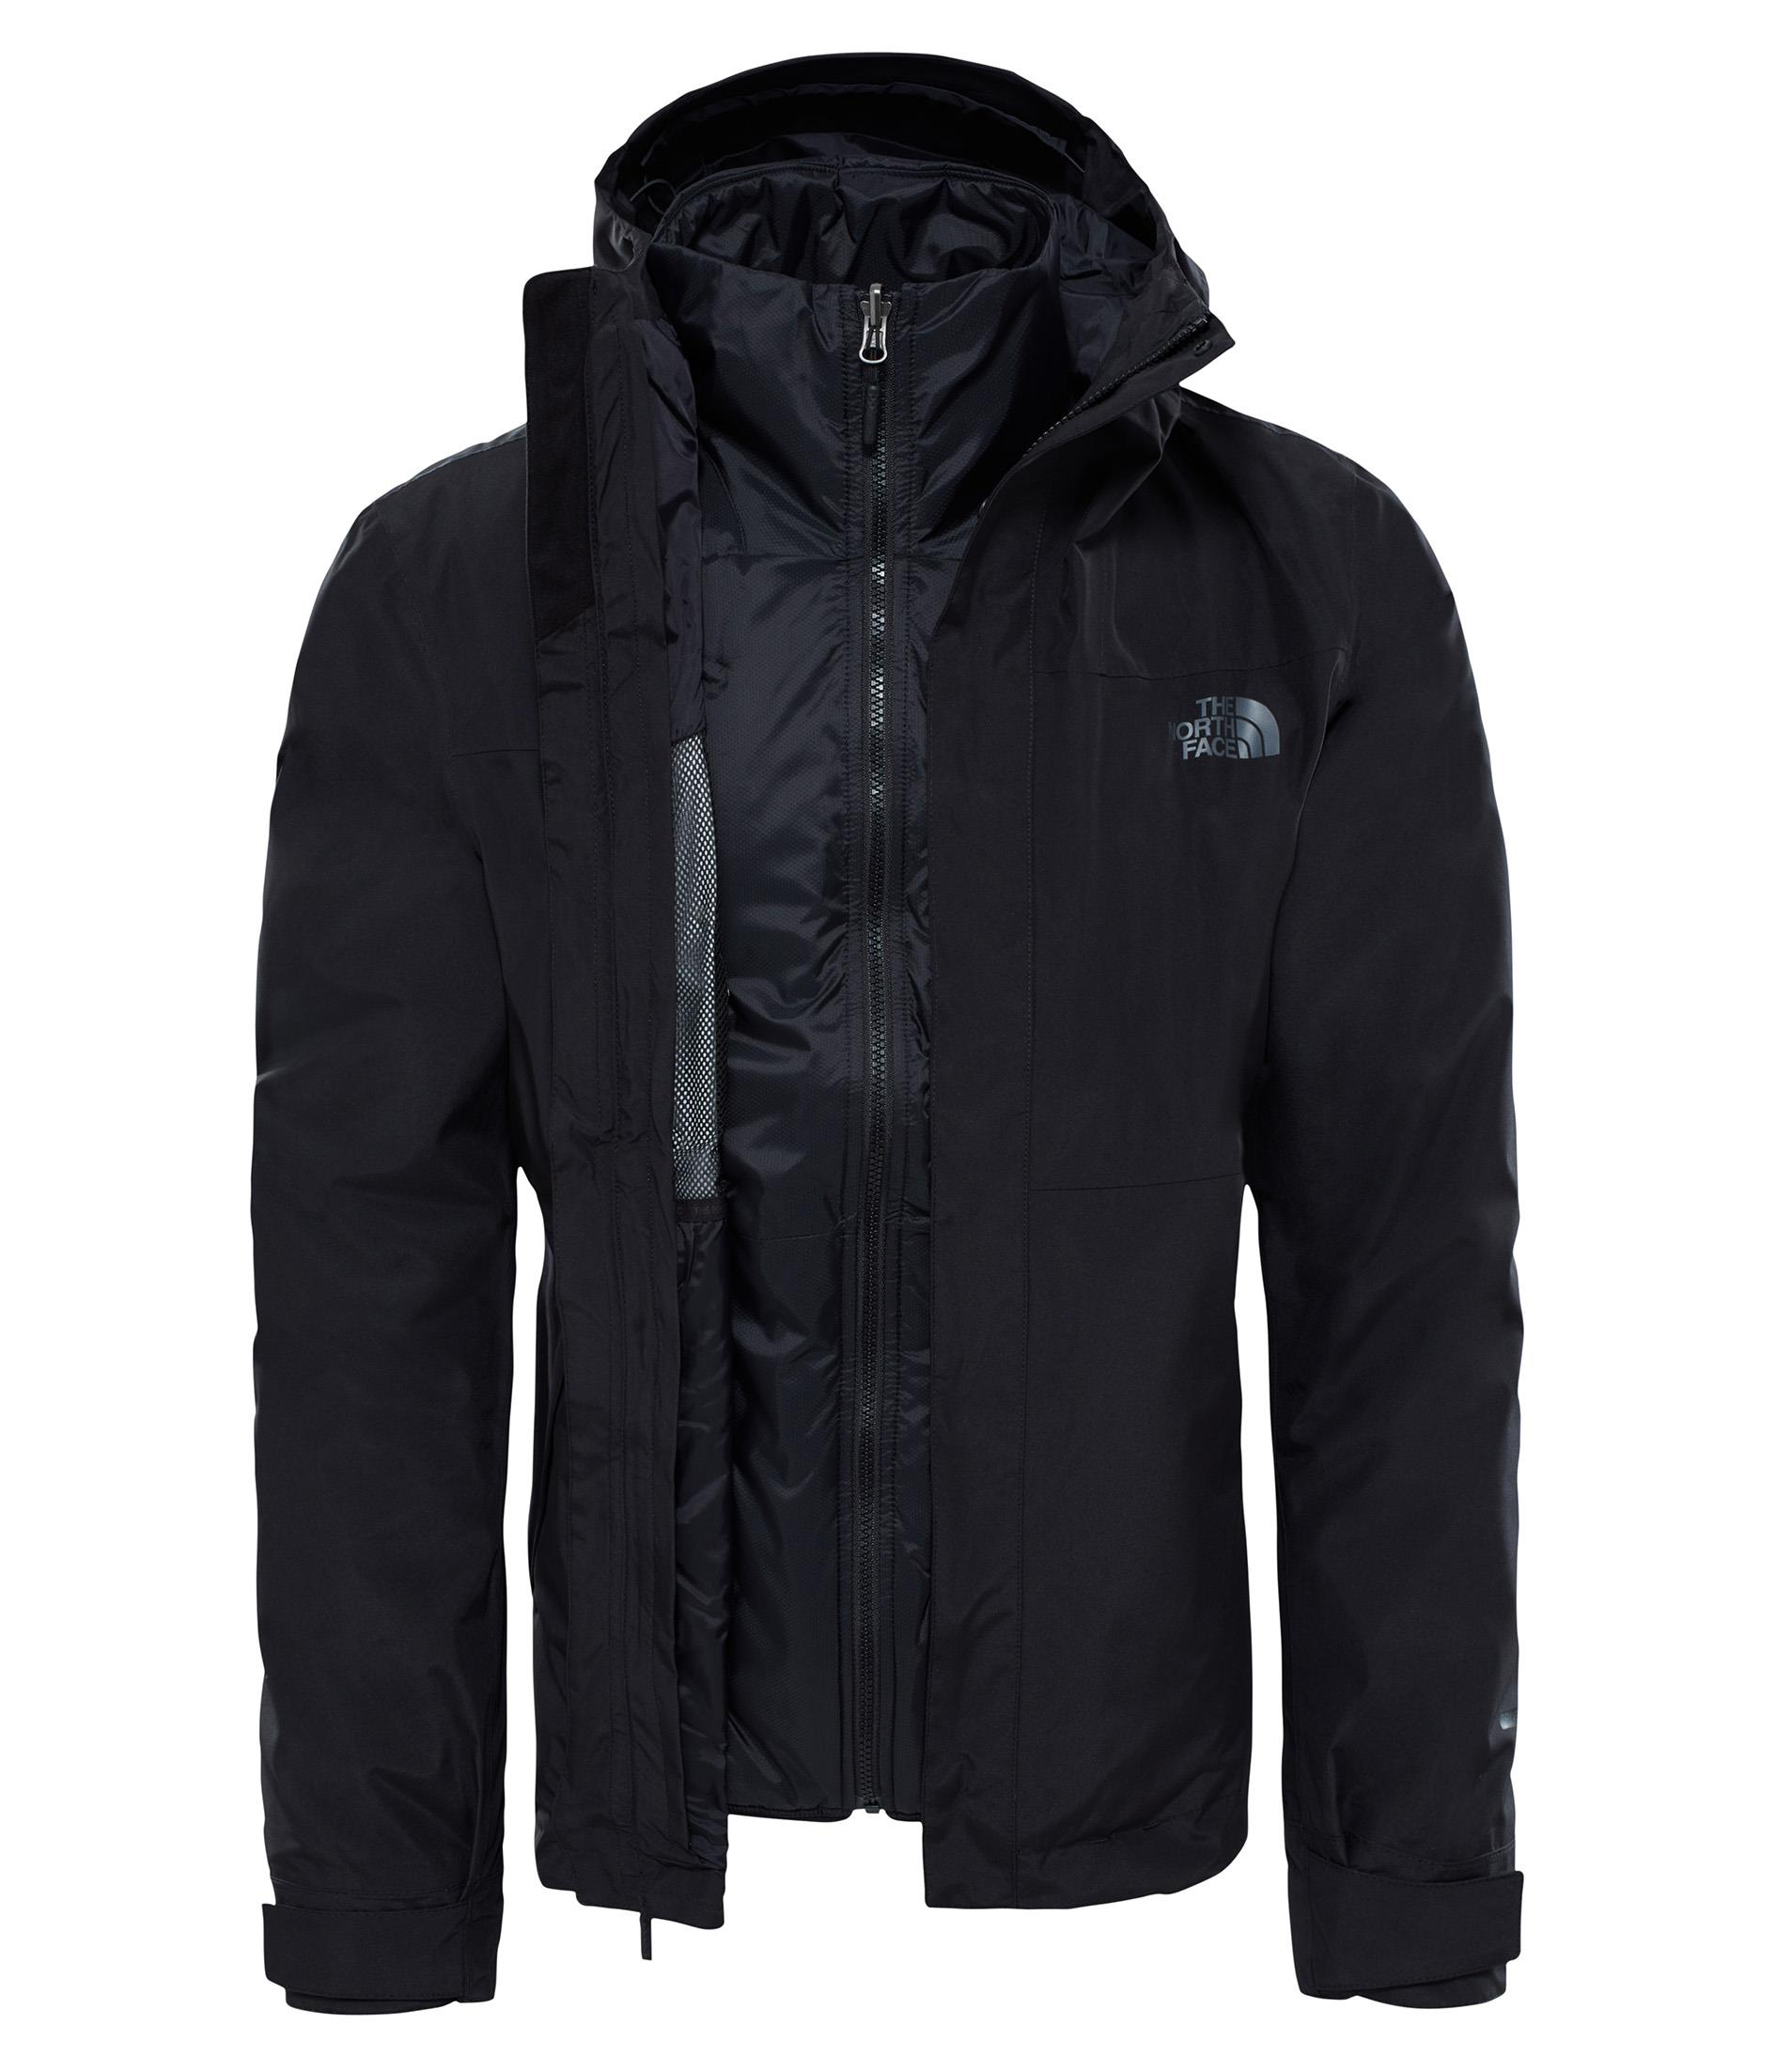 The North Face Erkek Naslund Trıclımate Ceket